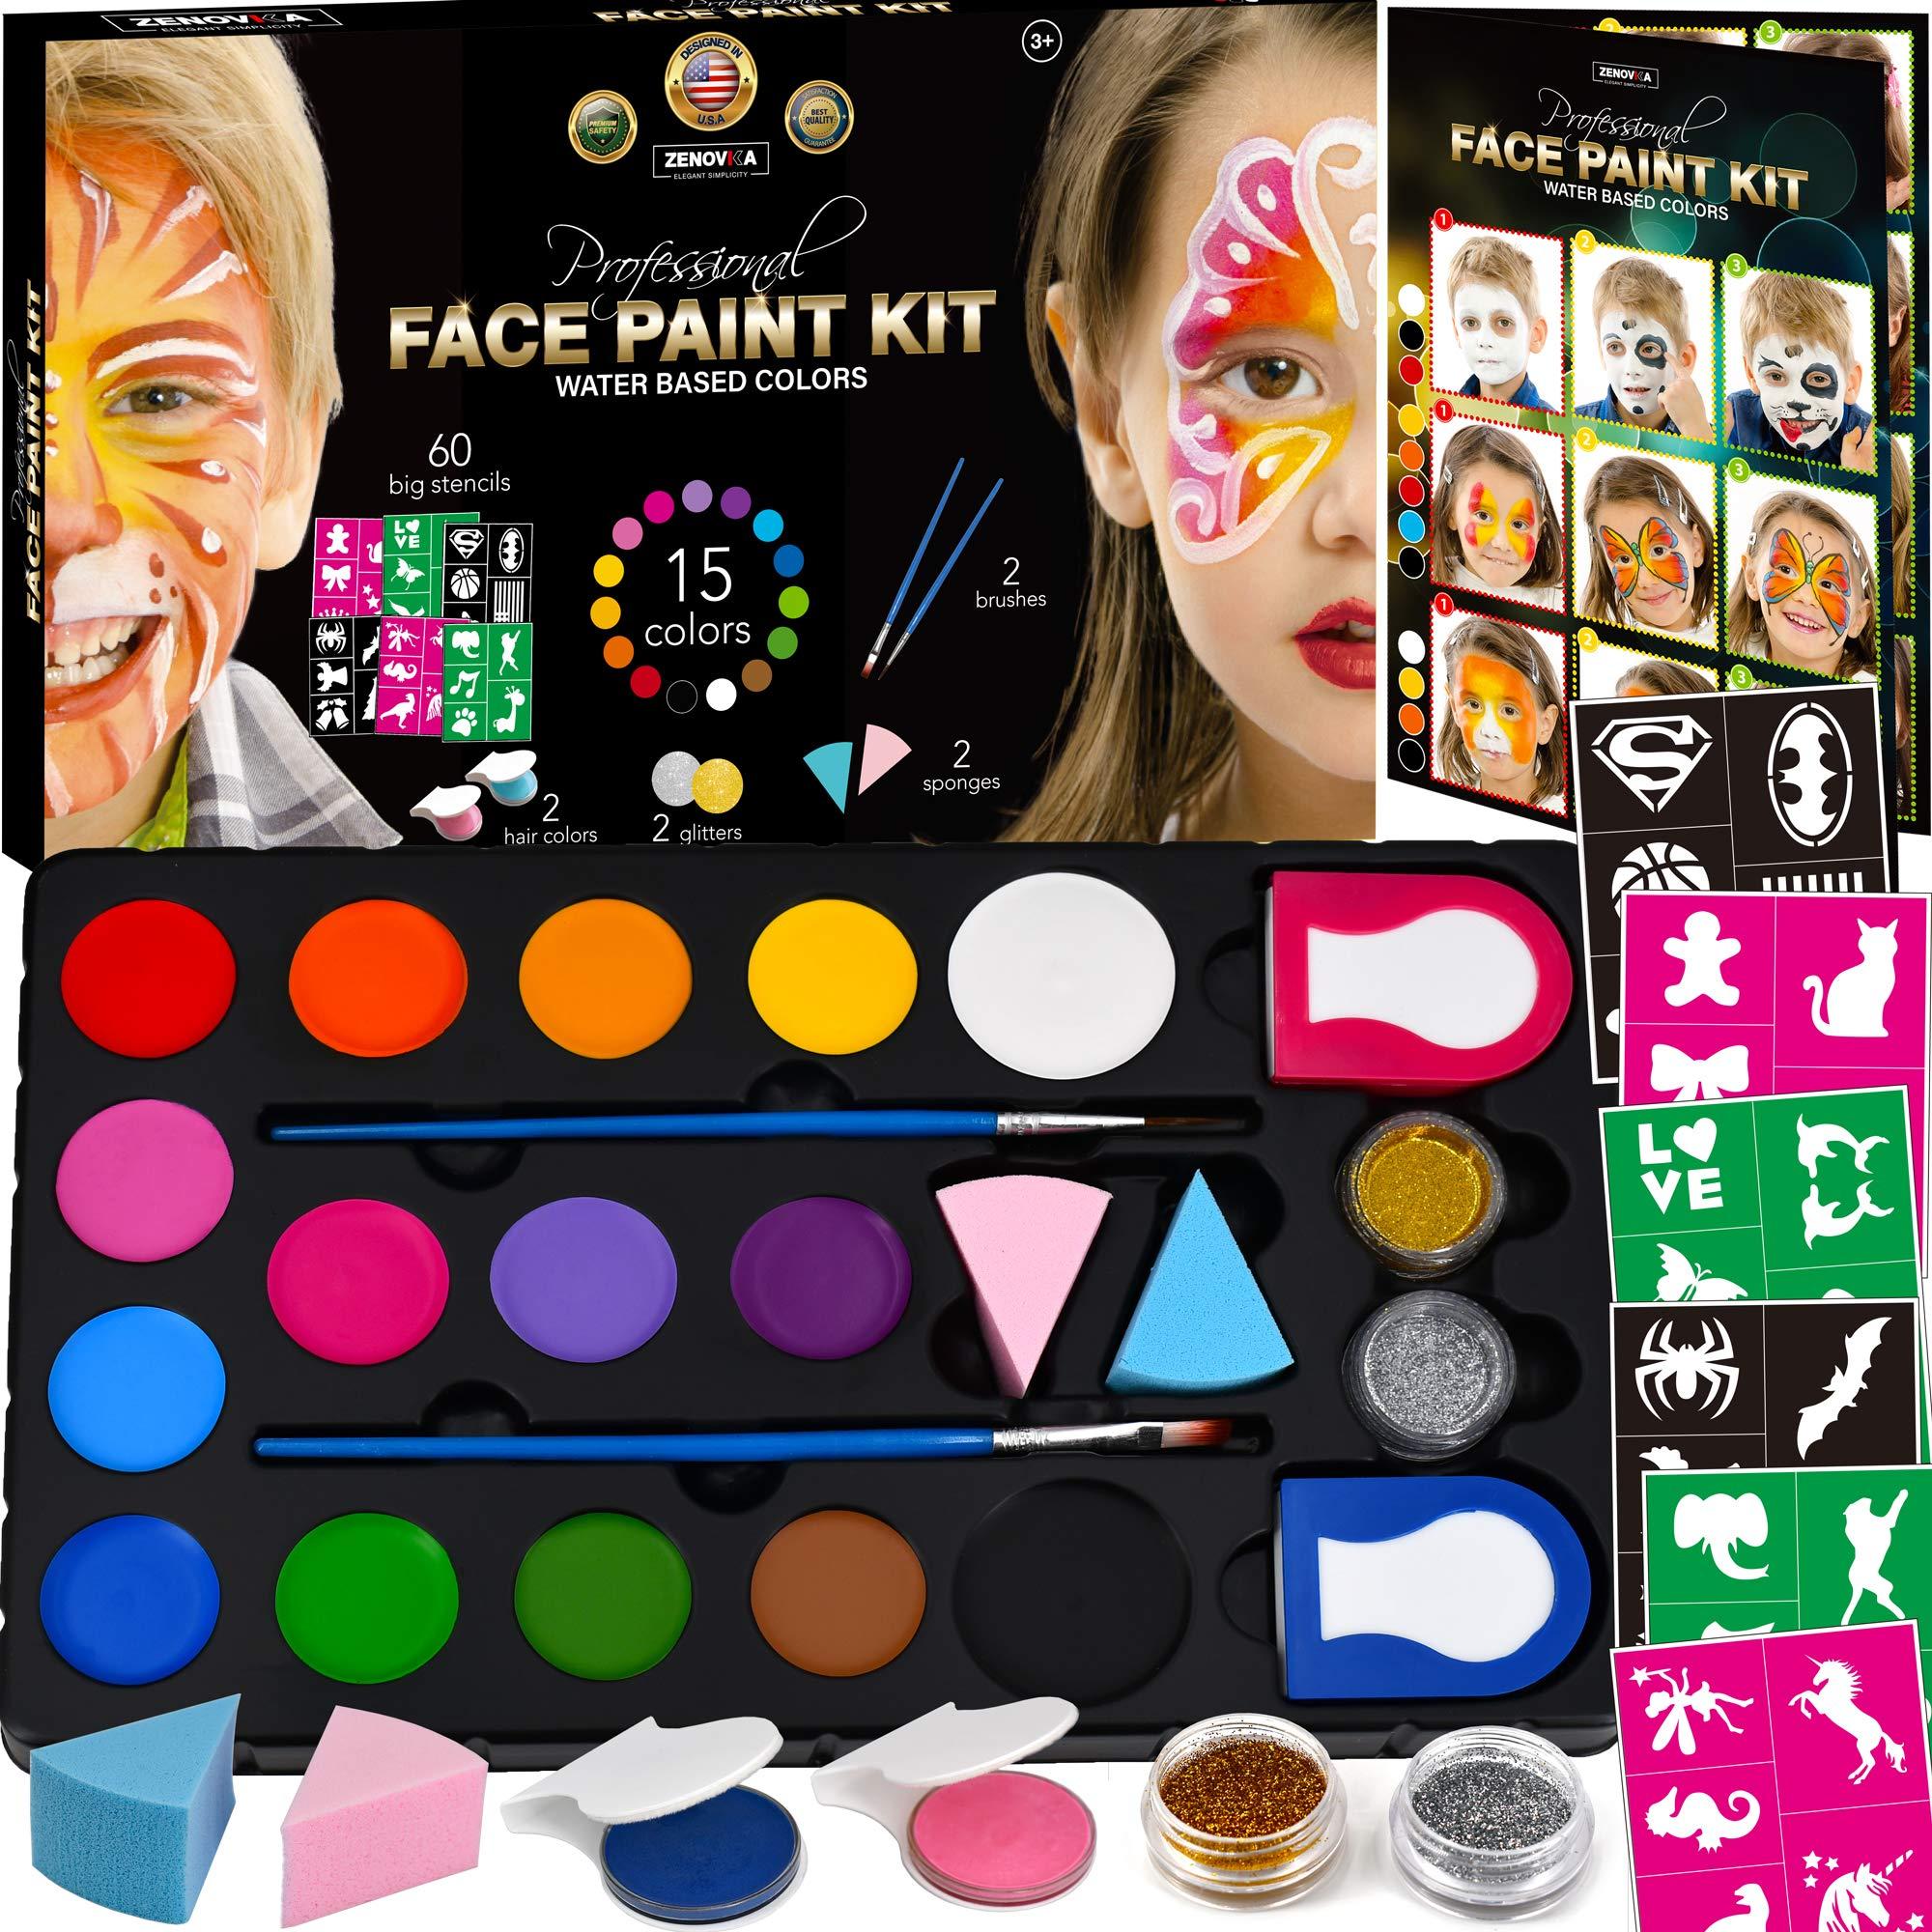 Face Paint Kit for Kids - 60 Jumbo Stencils, 15 Large Water Based Paints, 2 Glitters - Halloween Makeup Kit, Professional Face Paint Palette, Face Paints Safe for Sensitive Skin, Face Painting Book